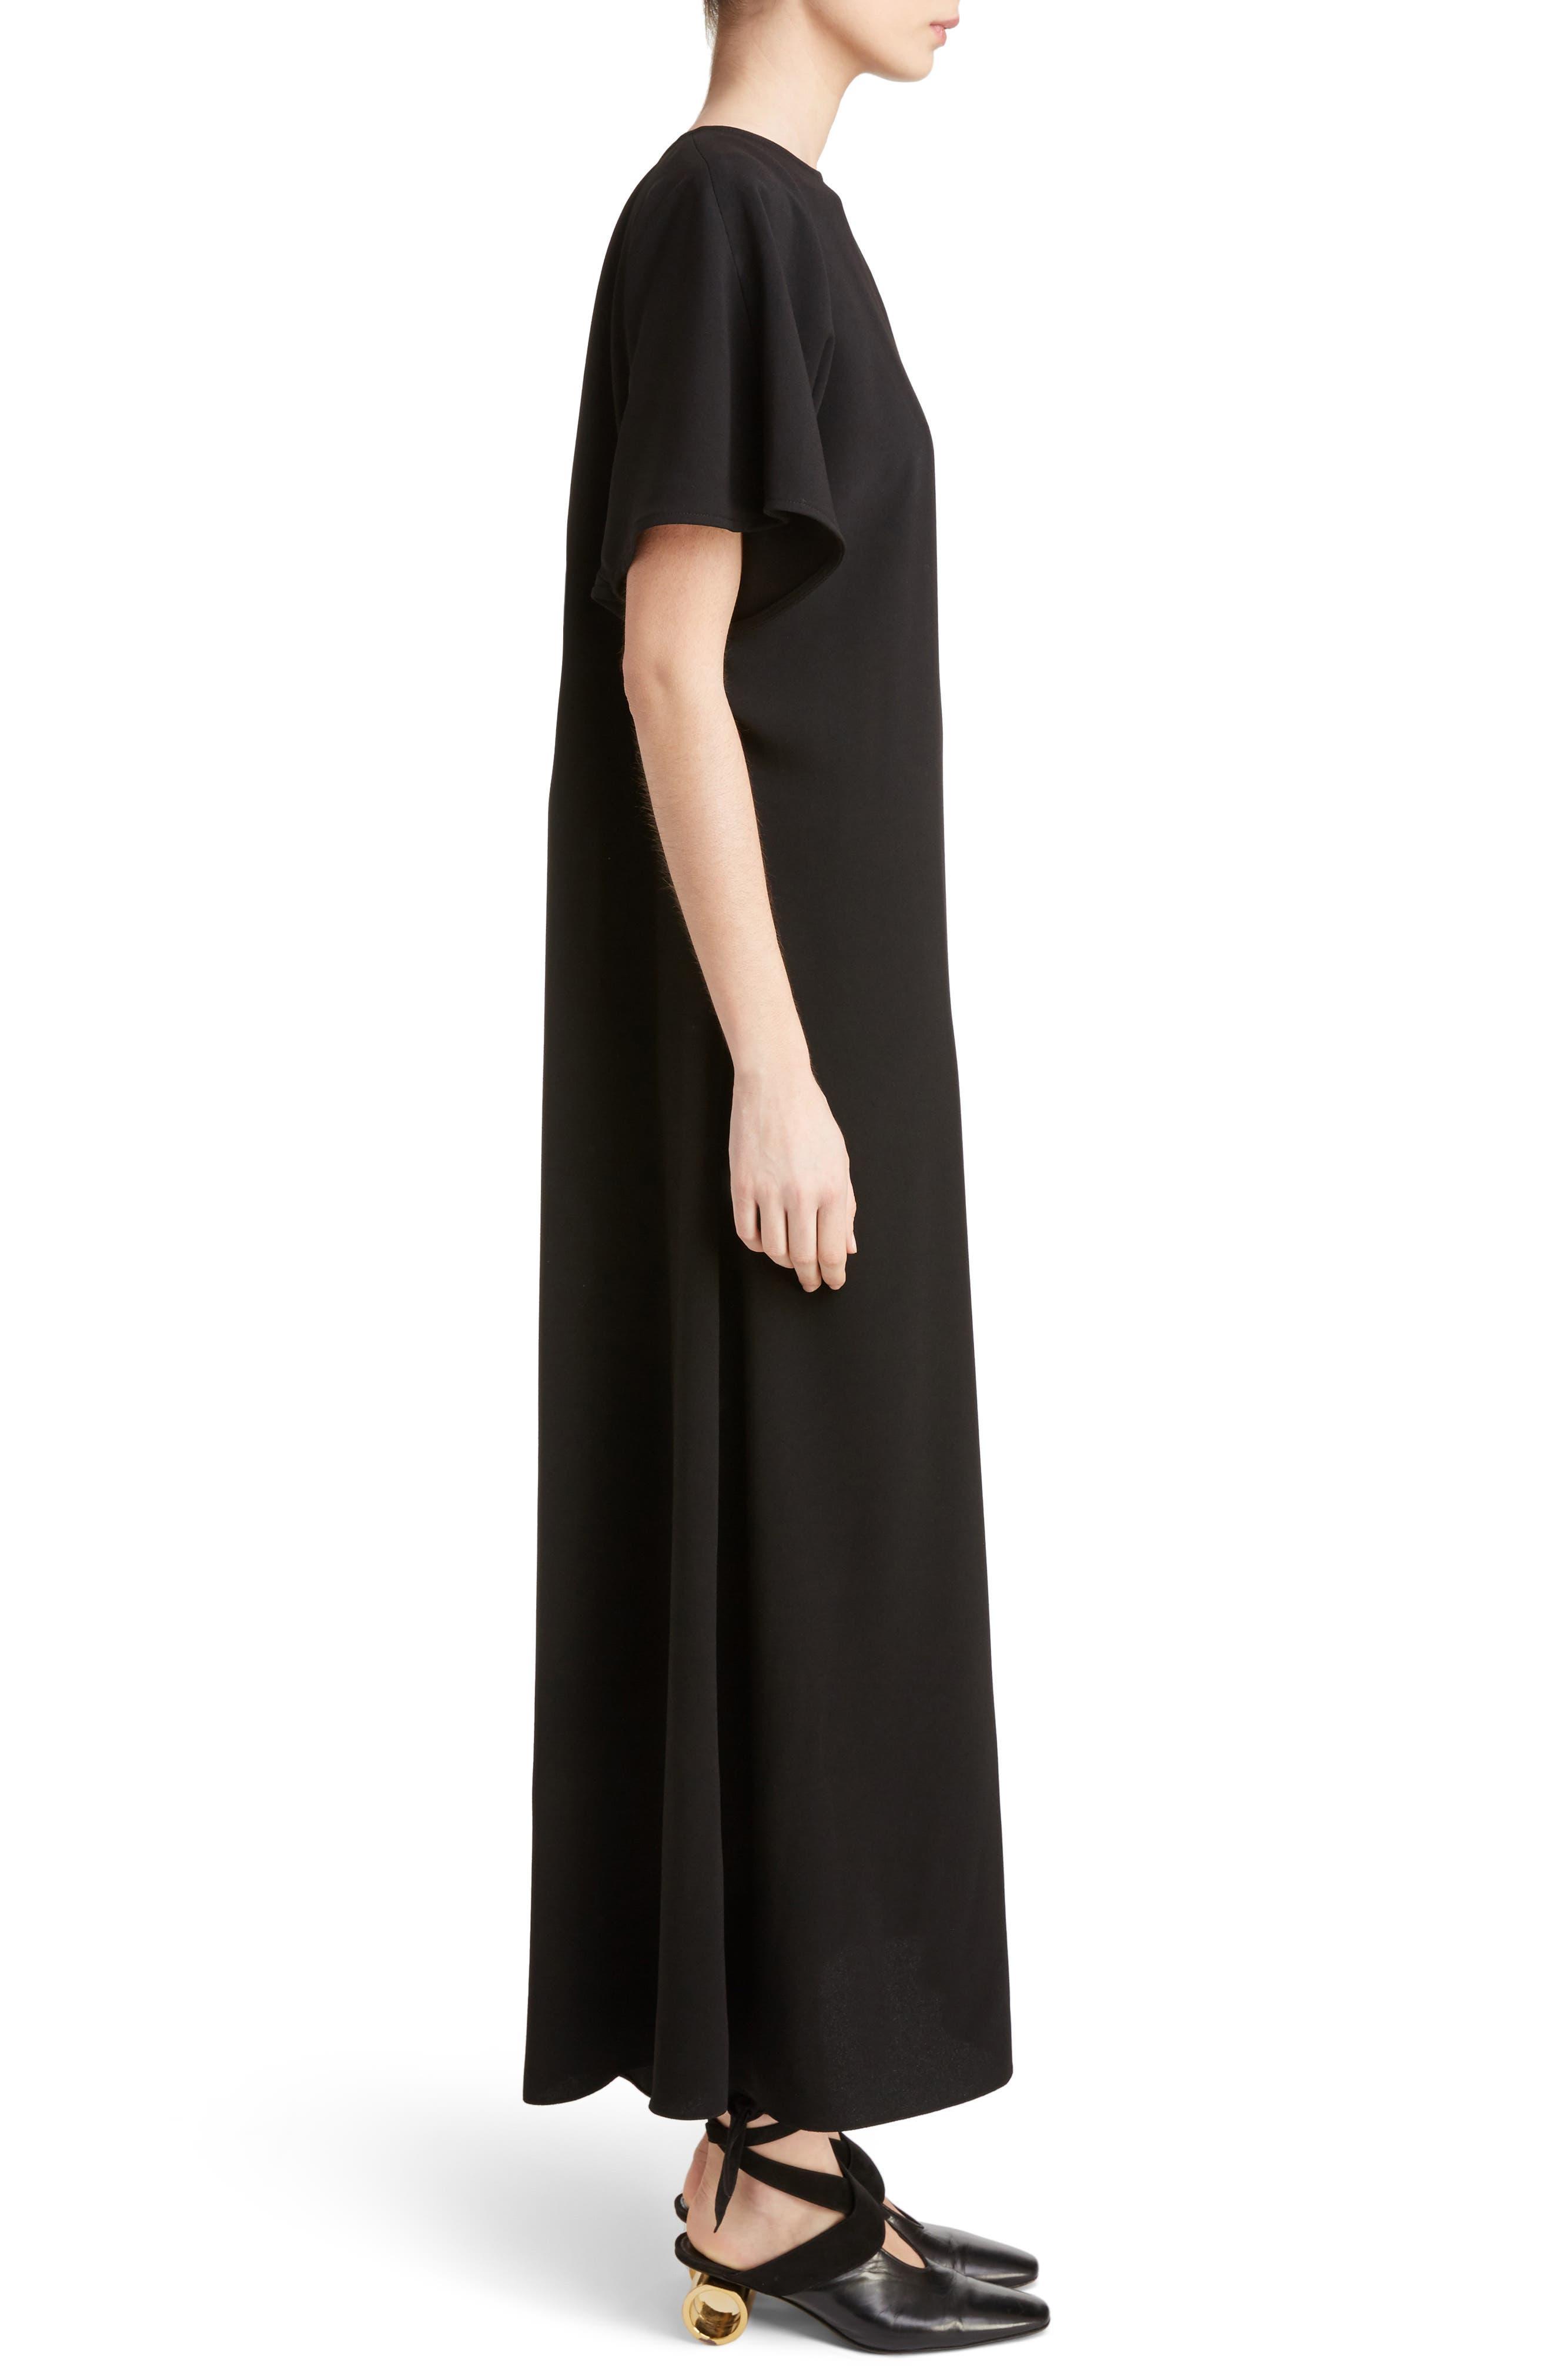 J.W.ANDERSON Cap Sleeve Maxi Dress,                             Alternate thumbnail 3, color,                             001